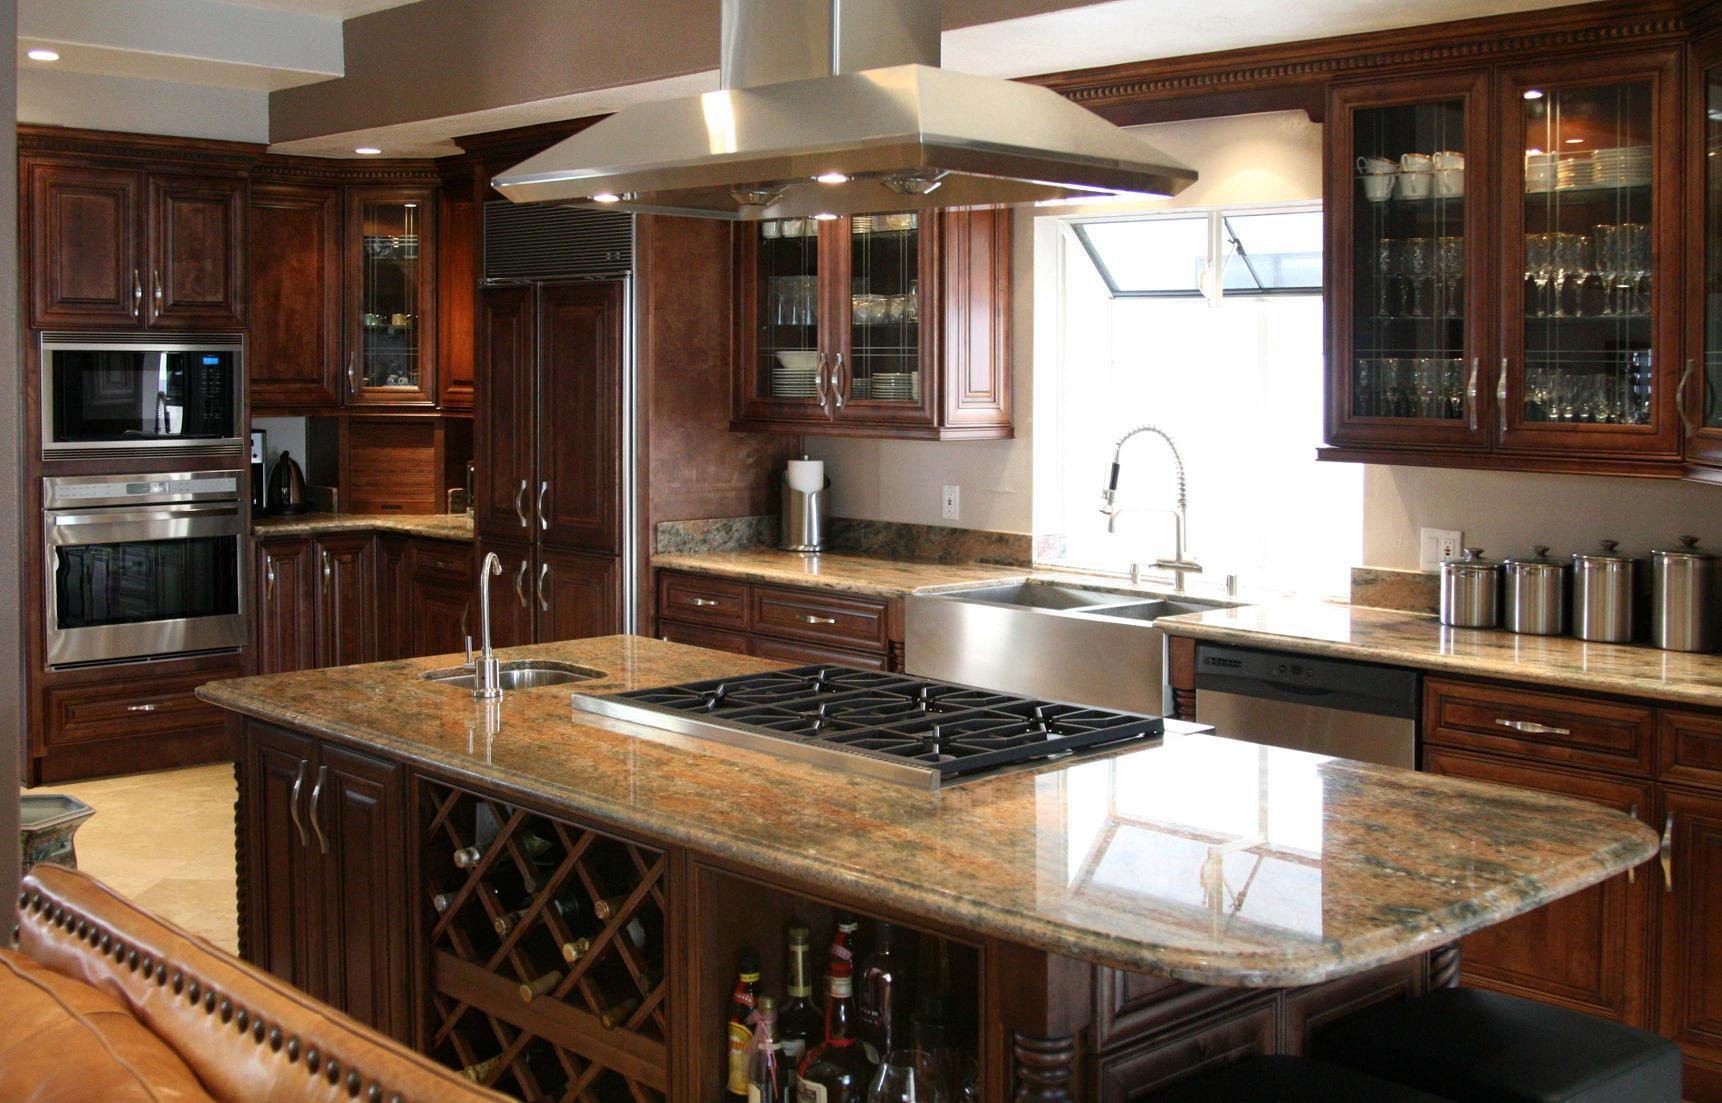 Cabinets Maple maple kitchen cabinets Chocolate Maple Glaze Contemporary Kitchen